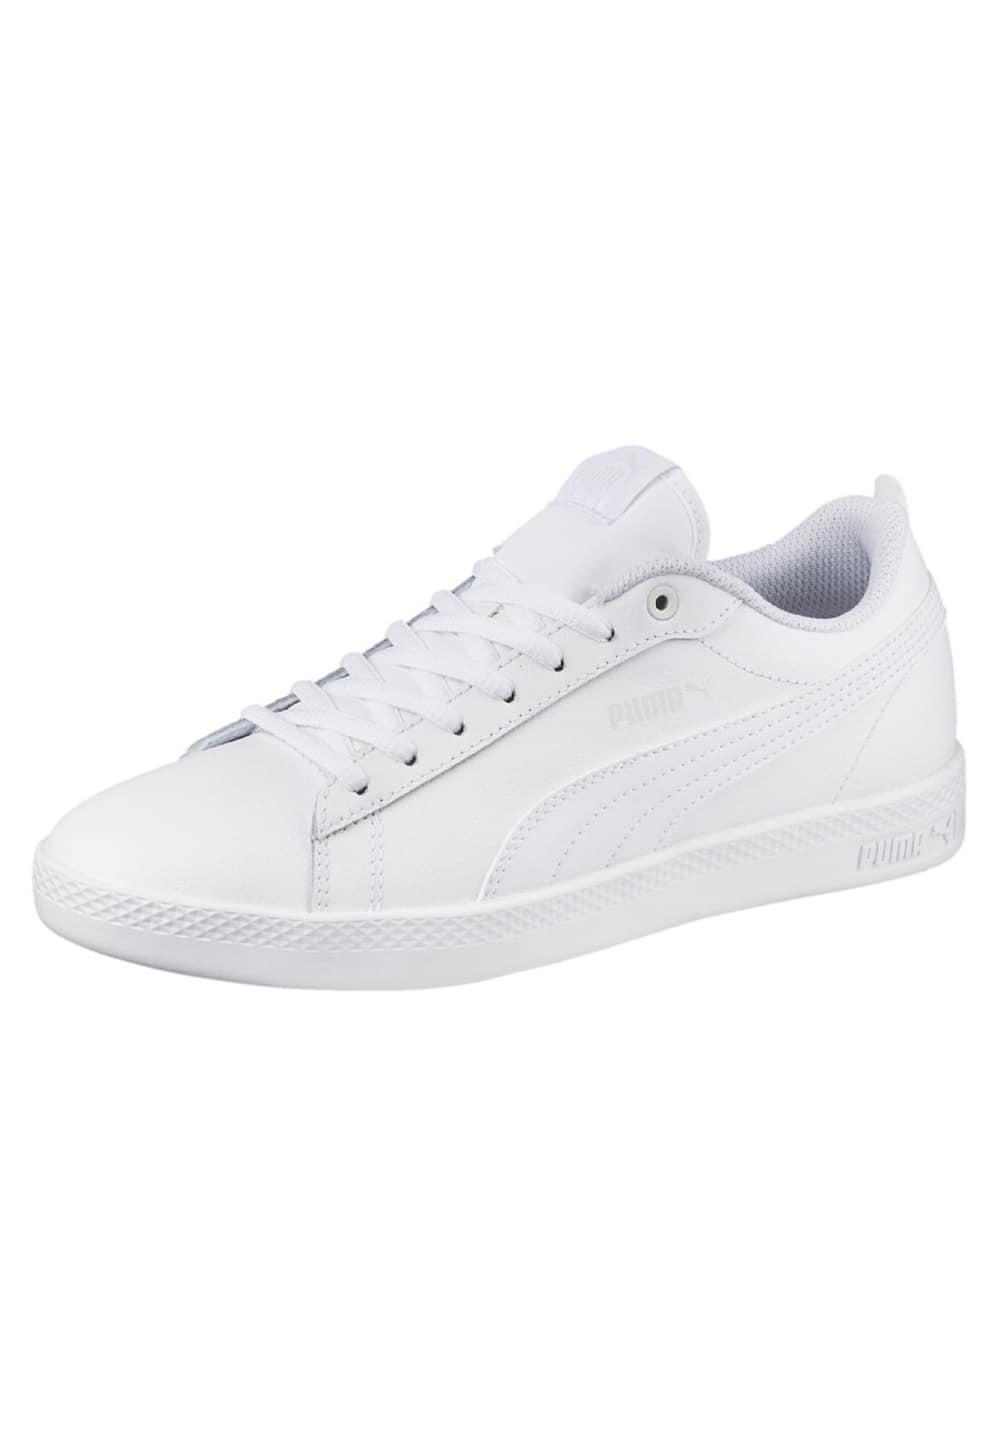 Puma Smash V2 L - Sneaker für Damen - Weiß